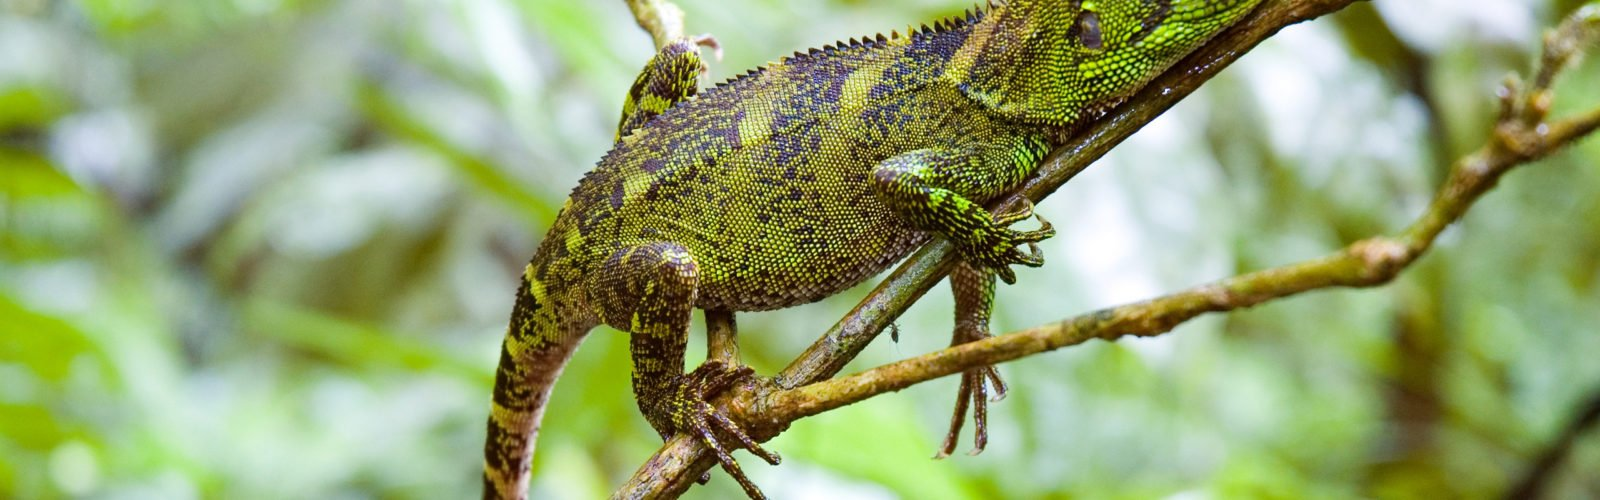 brazil-amazon-lizard